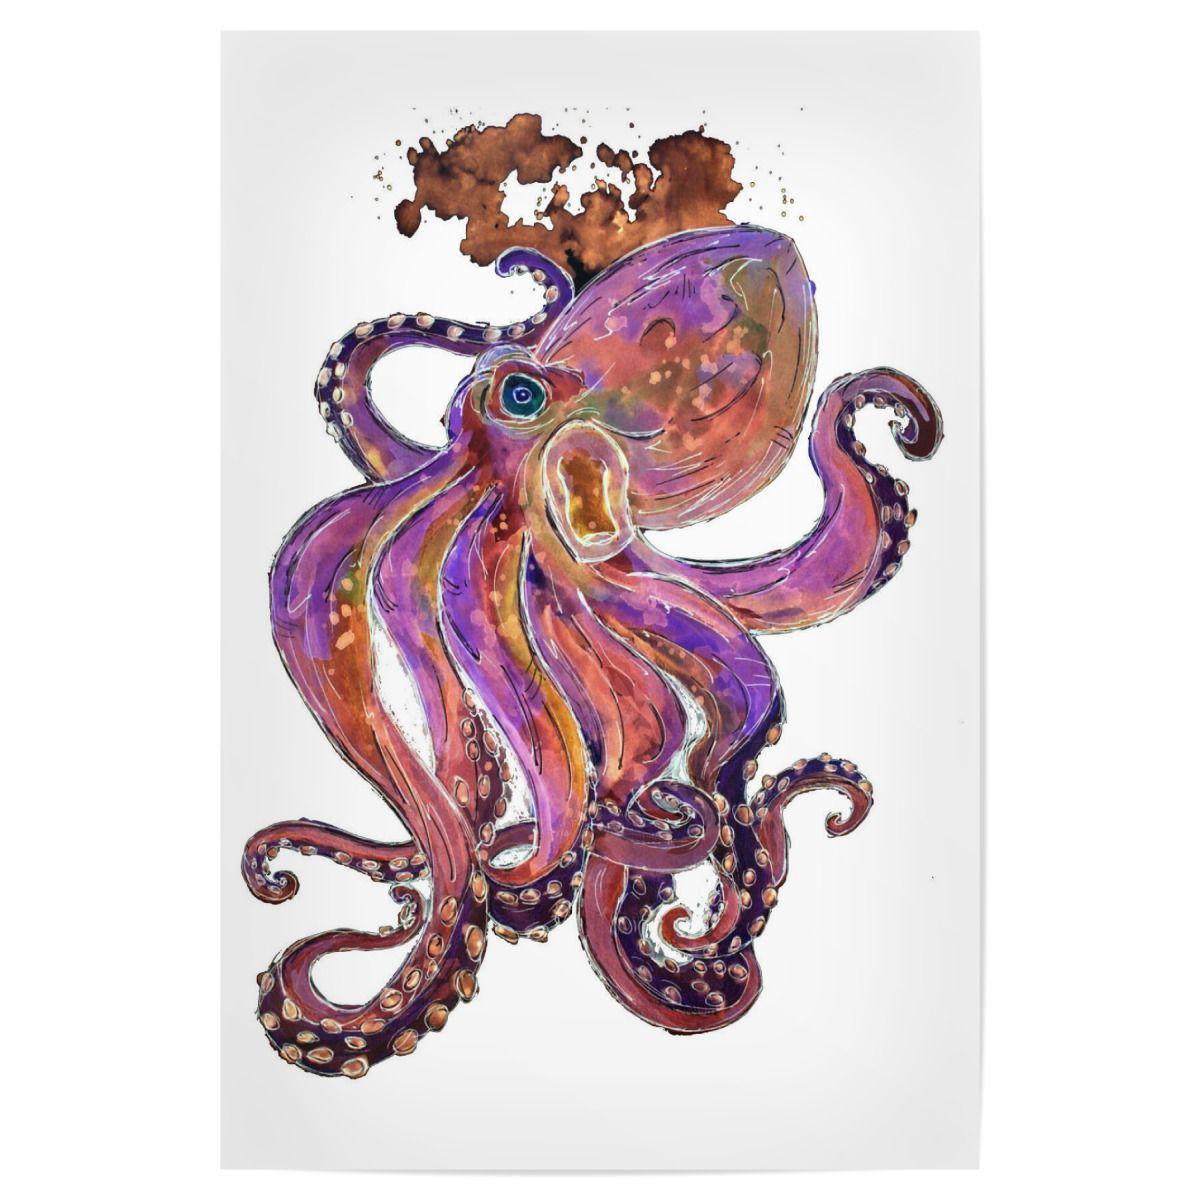 Purple Octopus Premium Poster - #ZeichenbloQ #artboxone #poster #artprint #homedecor #octopus #kraken #squid #tentacles